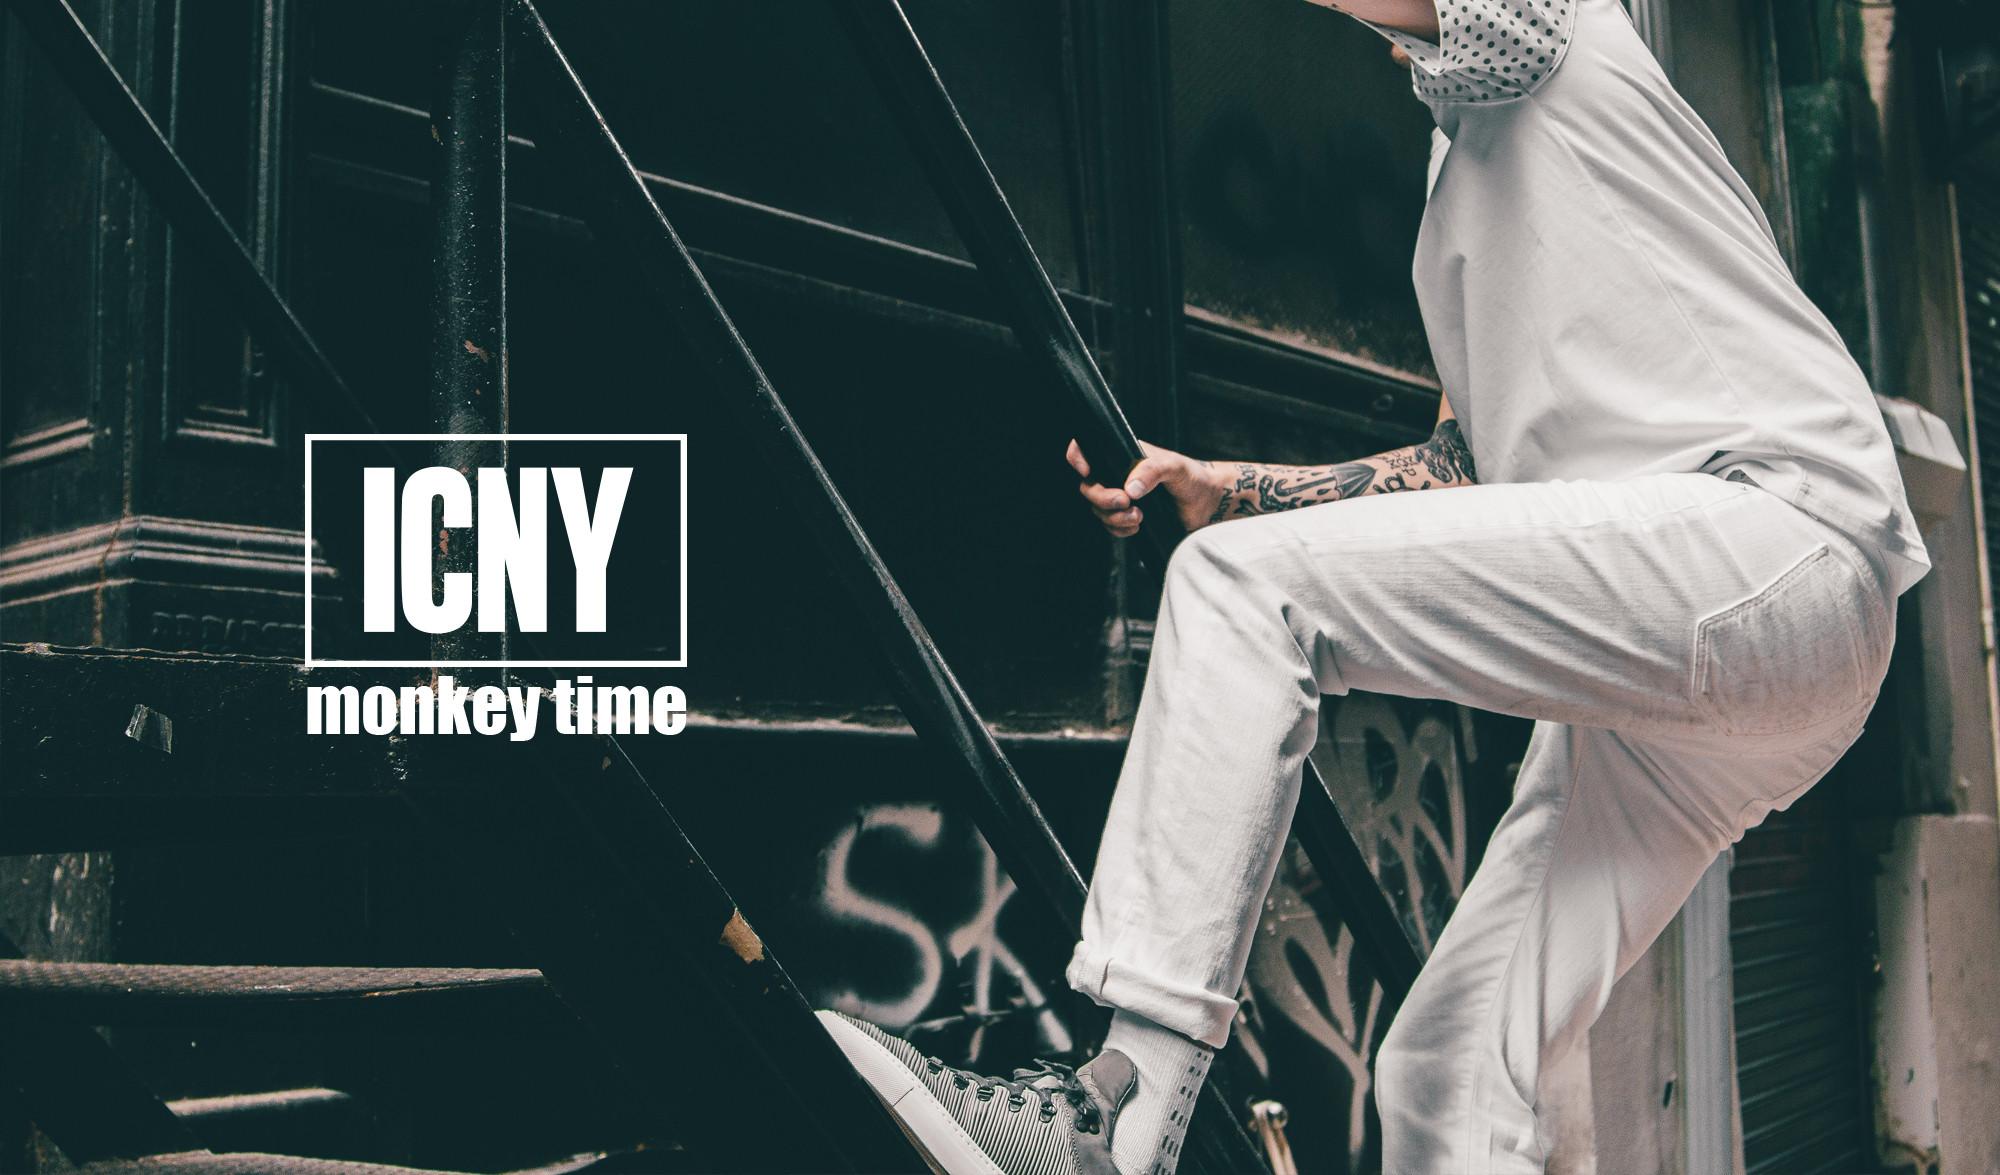 機能時尚品牌ICNY與日本品牌Monkey Time 2015聯名系列 - TRENDSFOLIO